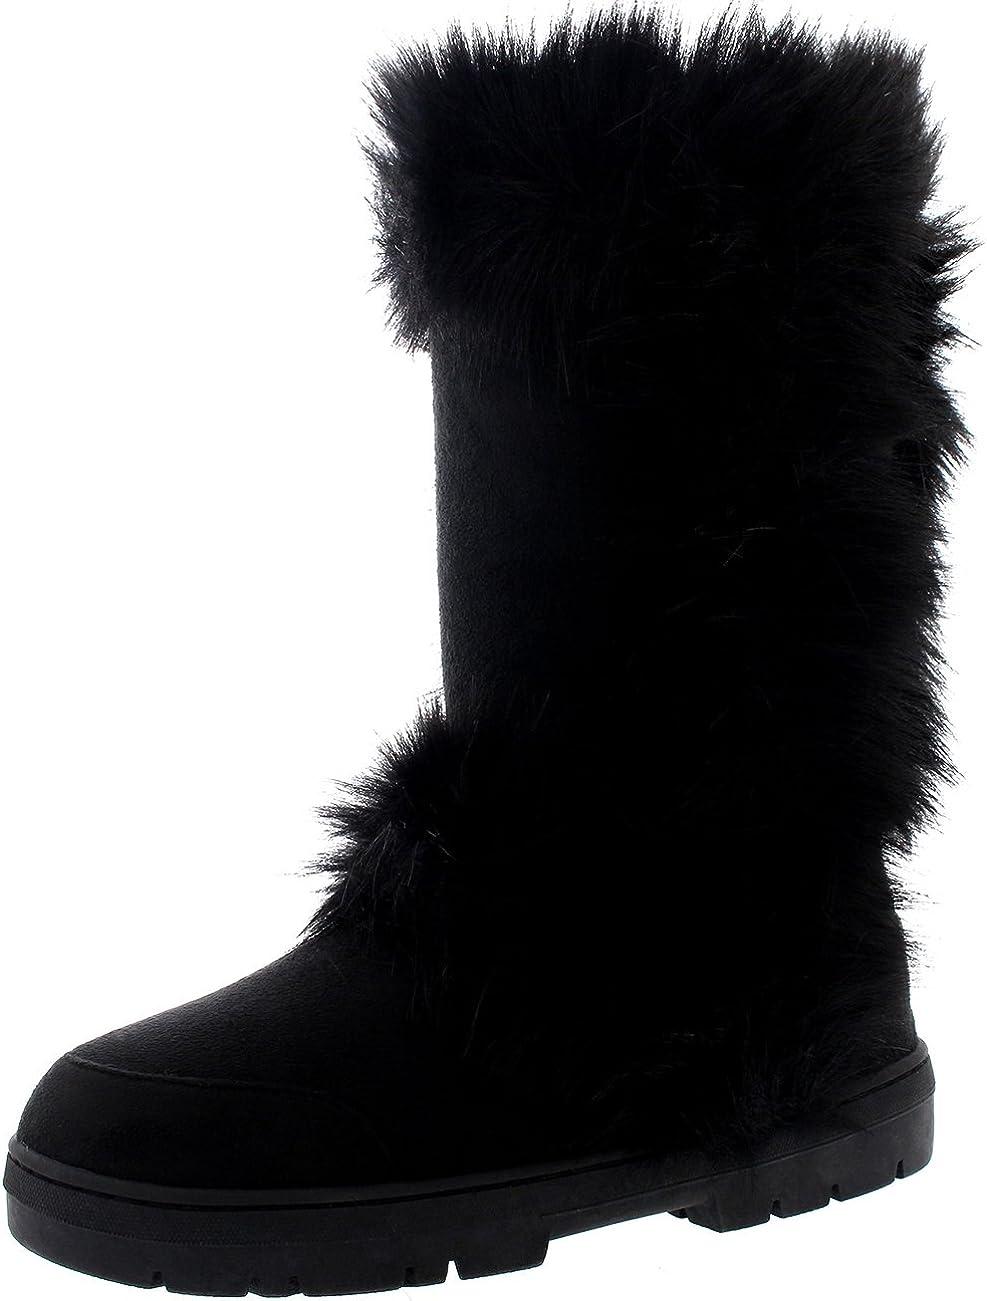 Womens Mid Calf Hard Sole Waterproof Winter Boots